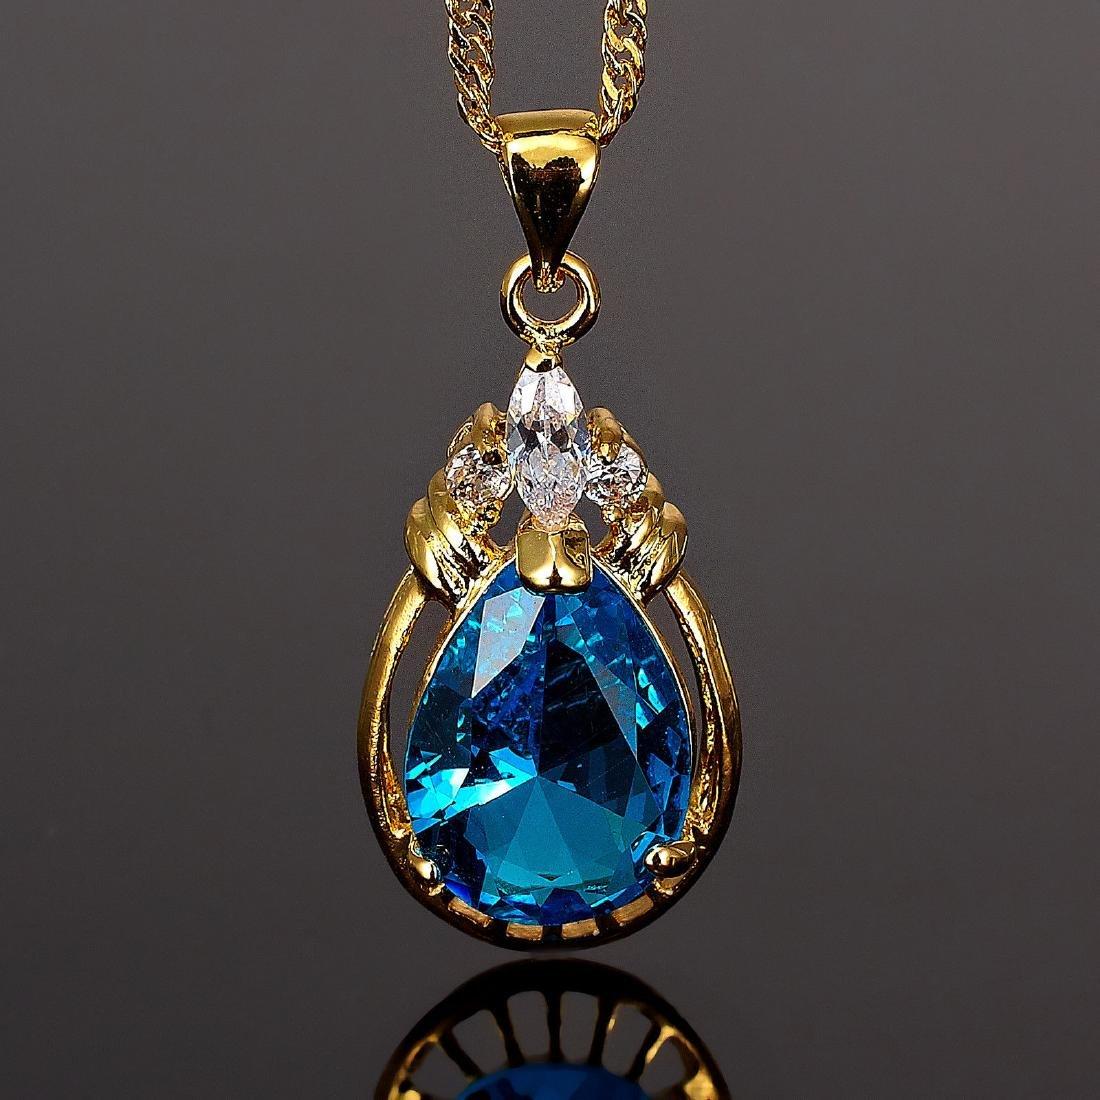 Women Jewelry 18K Yellow GP Pendant-Necklace